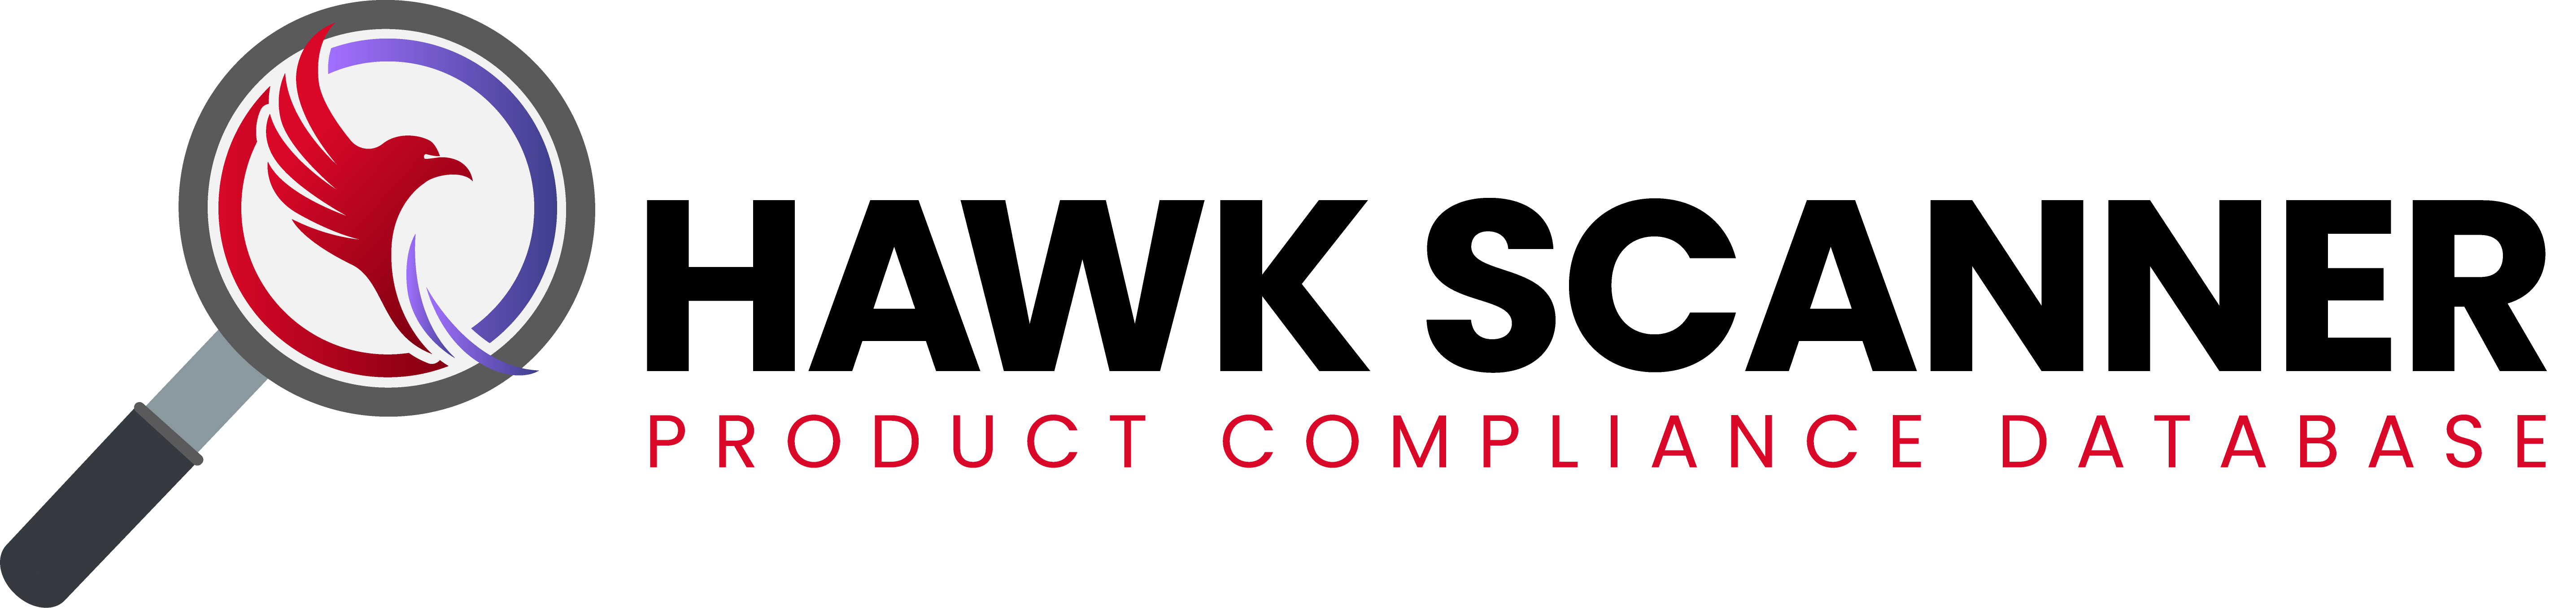 Hawk Scanner